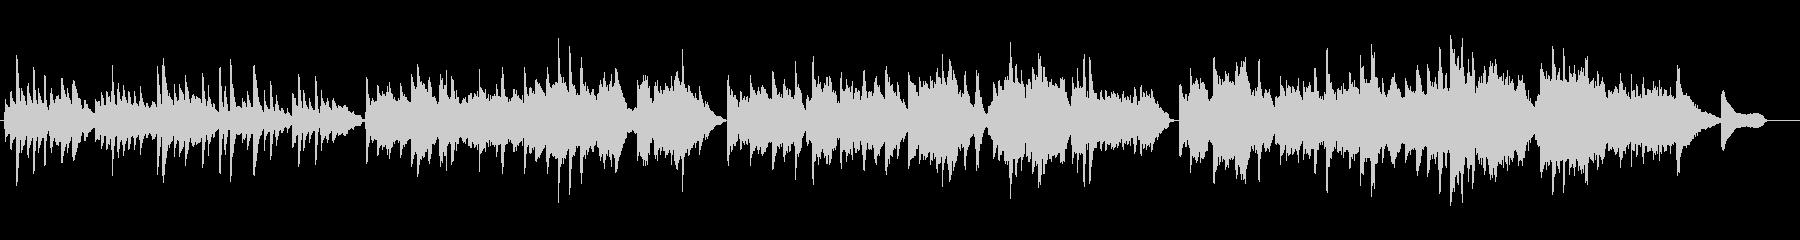 MESSAGE Pf+Vl+Flの未再生の波形